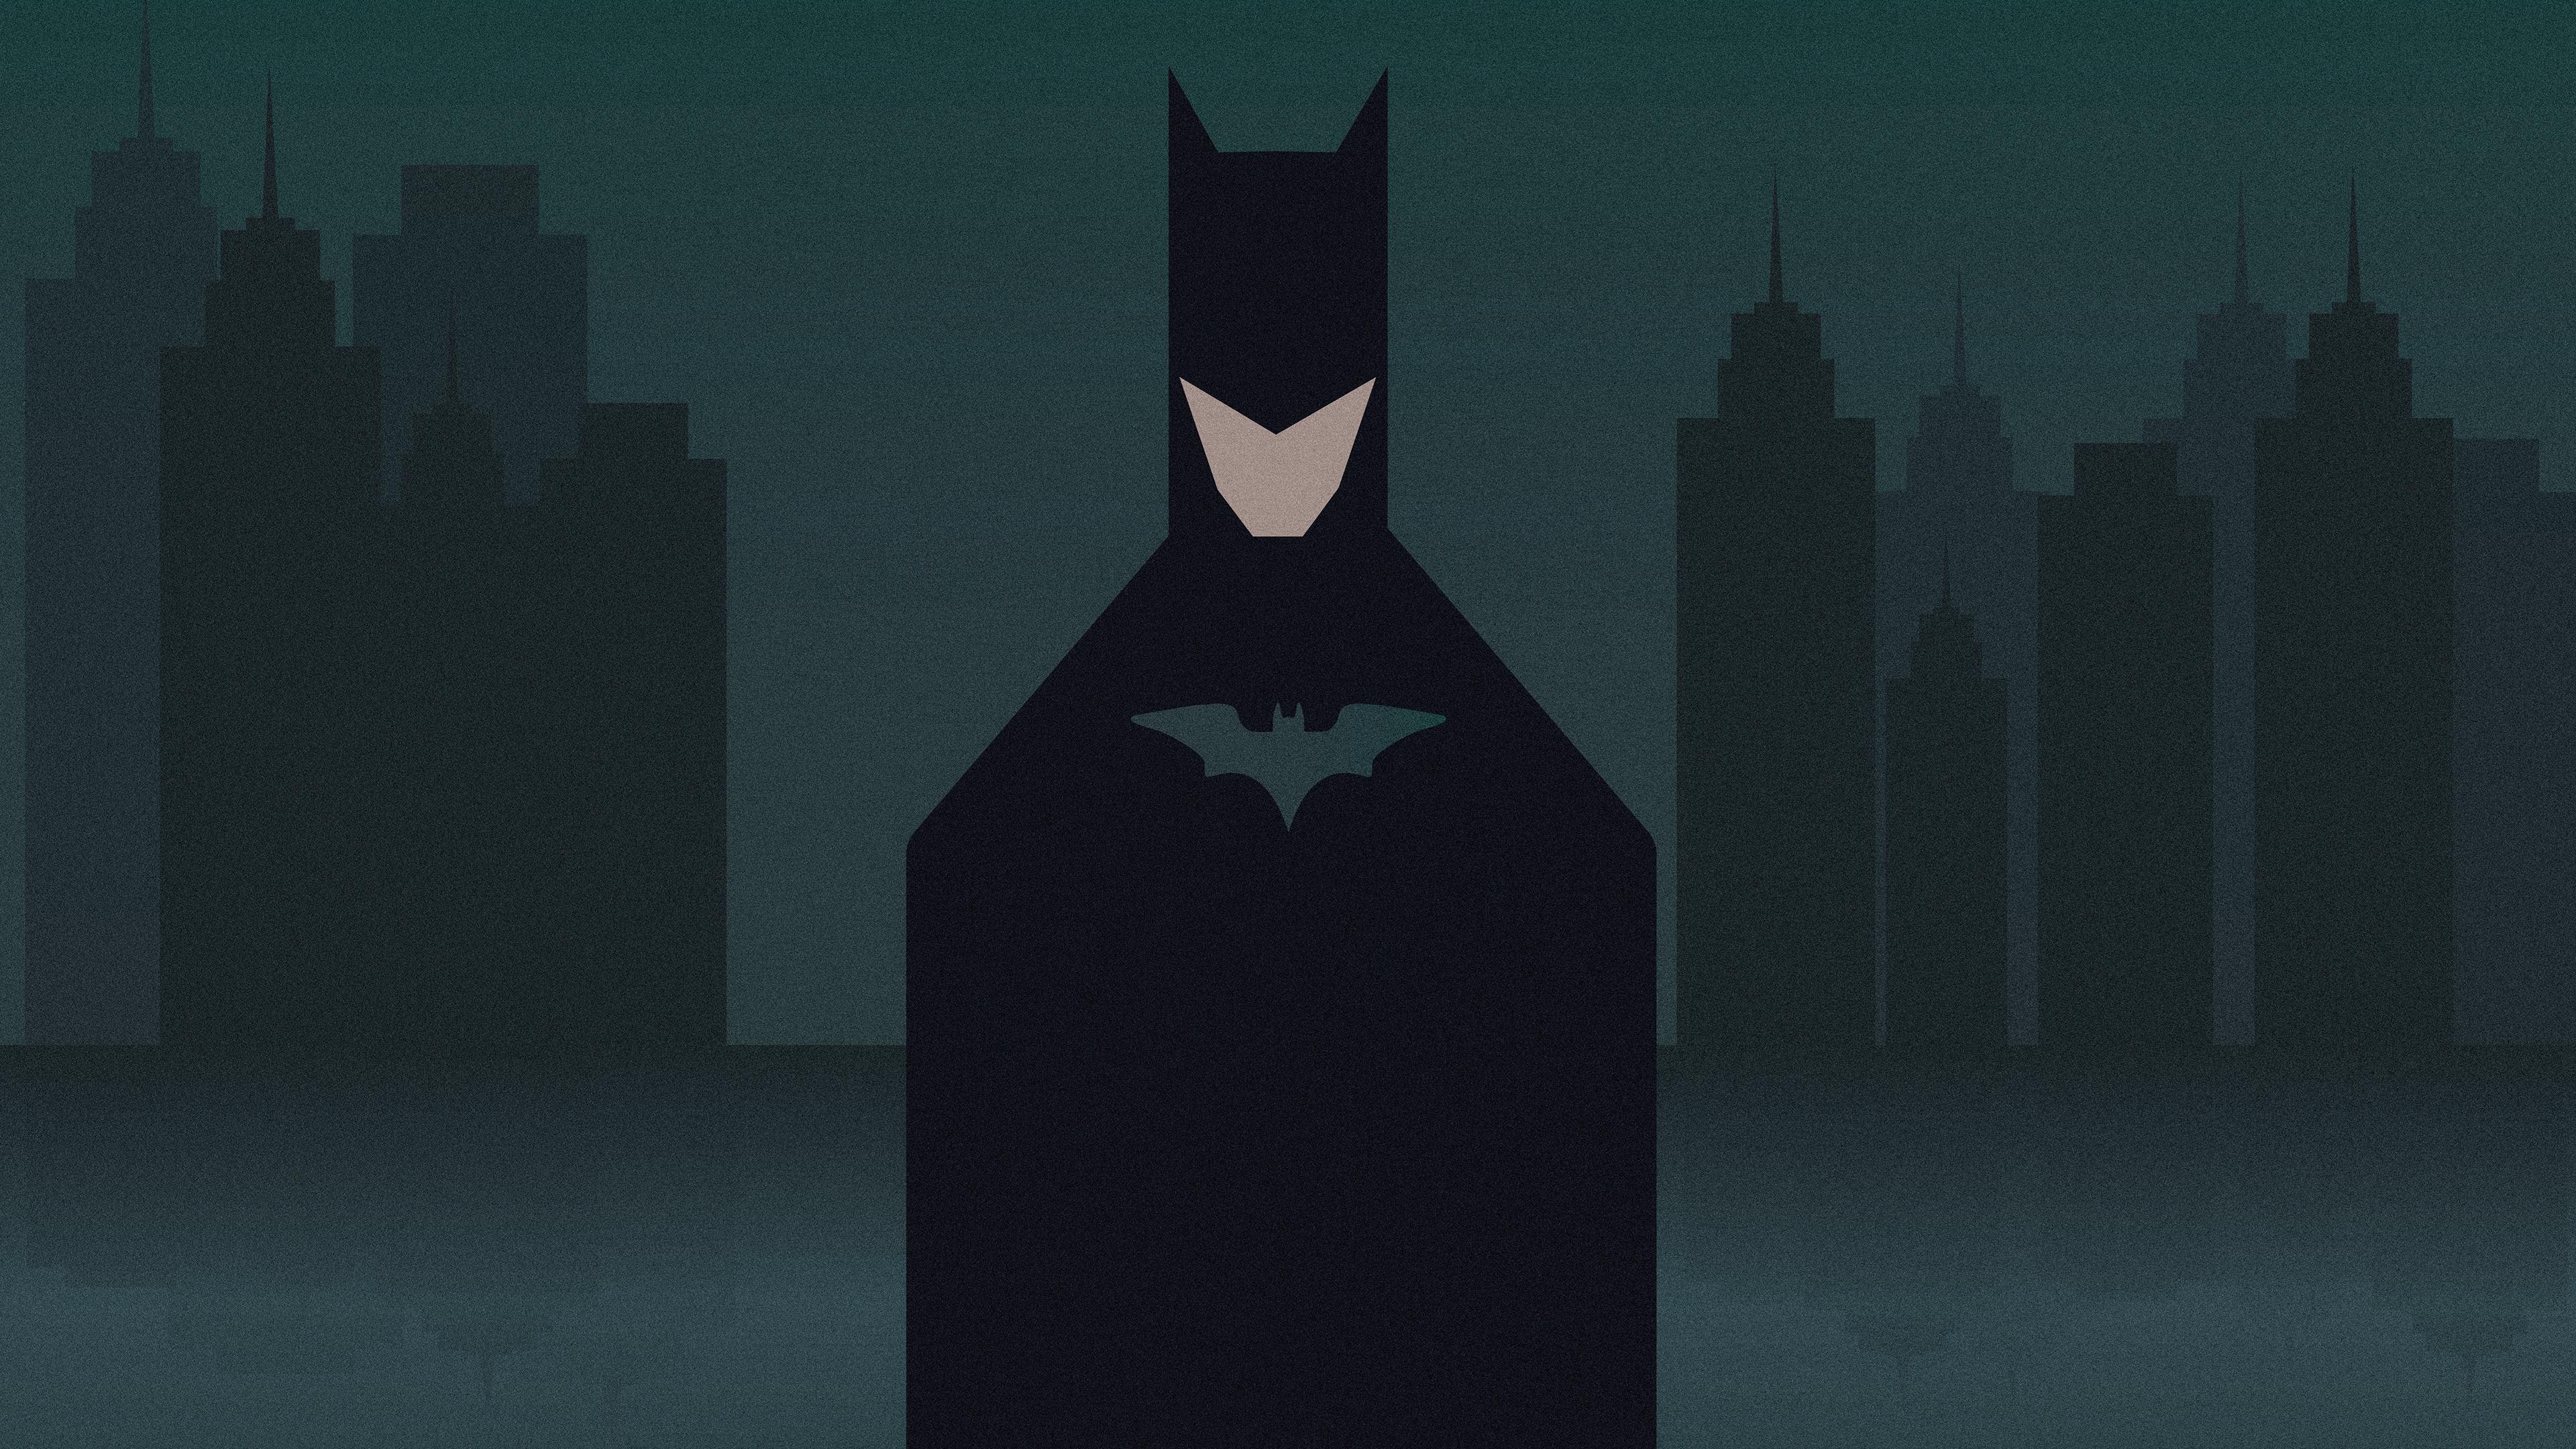 batman minimal 1568055247 - Batman Minimal - superheroes wallpapers, hd-wallpapers, digital art wallpapers, behance wallpapers, batman wallpapers, artwork wallpapers, 4k-wallpapers